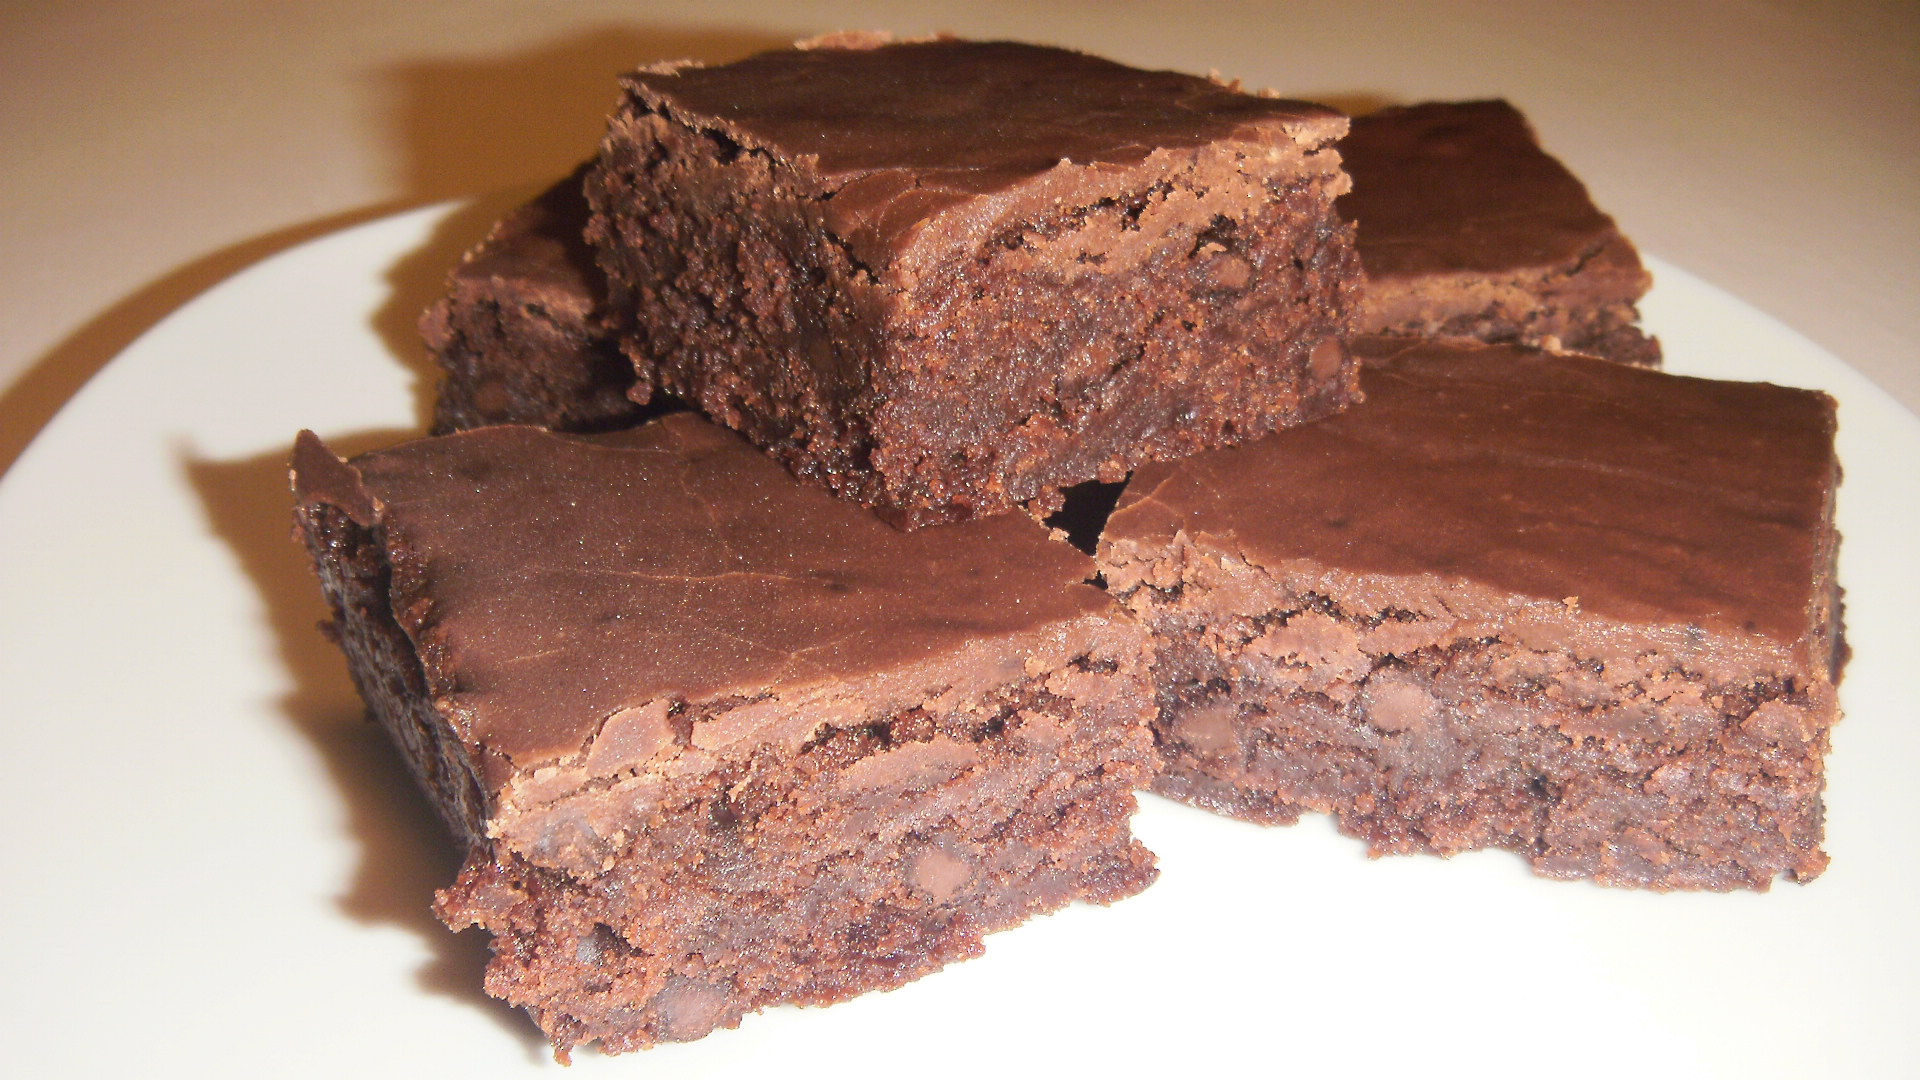 ... Peanut/Tree Nut Free Decadent Brownies | The Food Allergy Chronicles